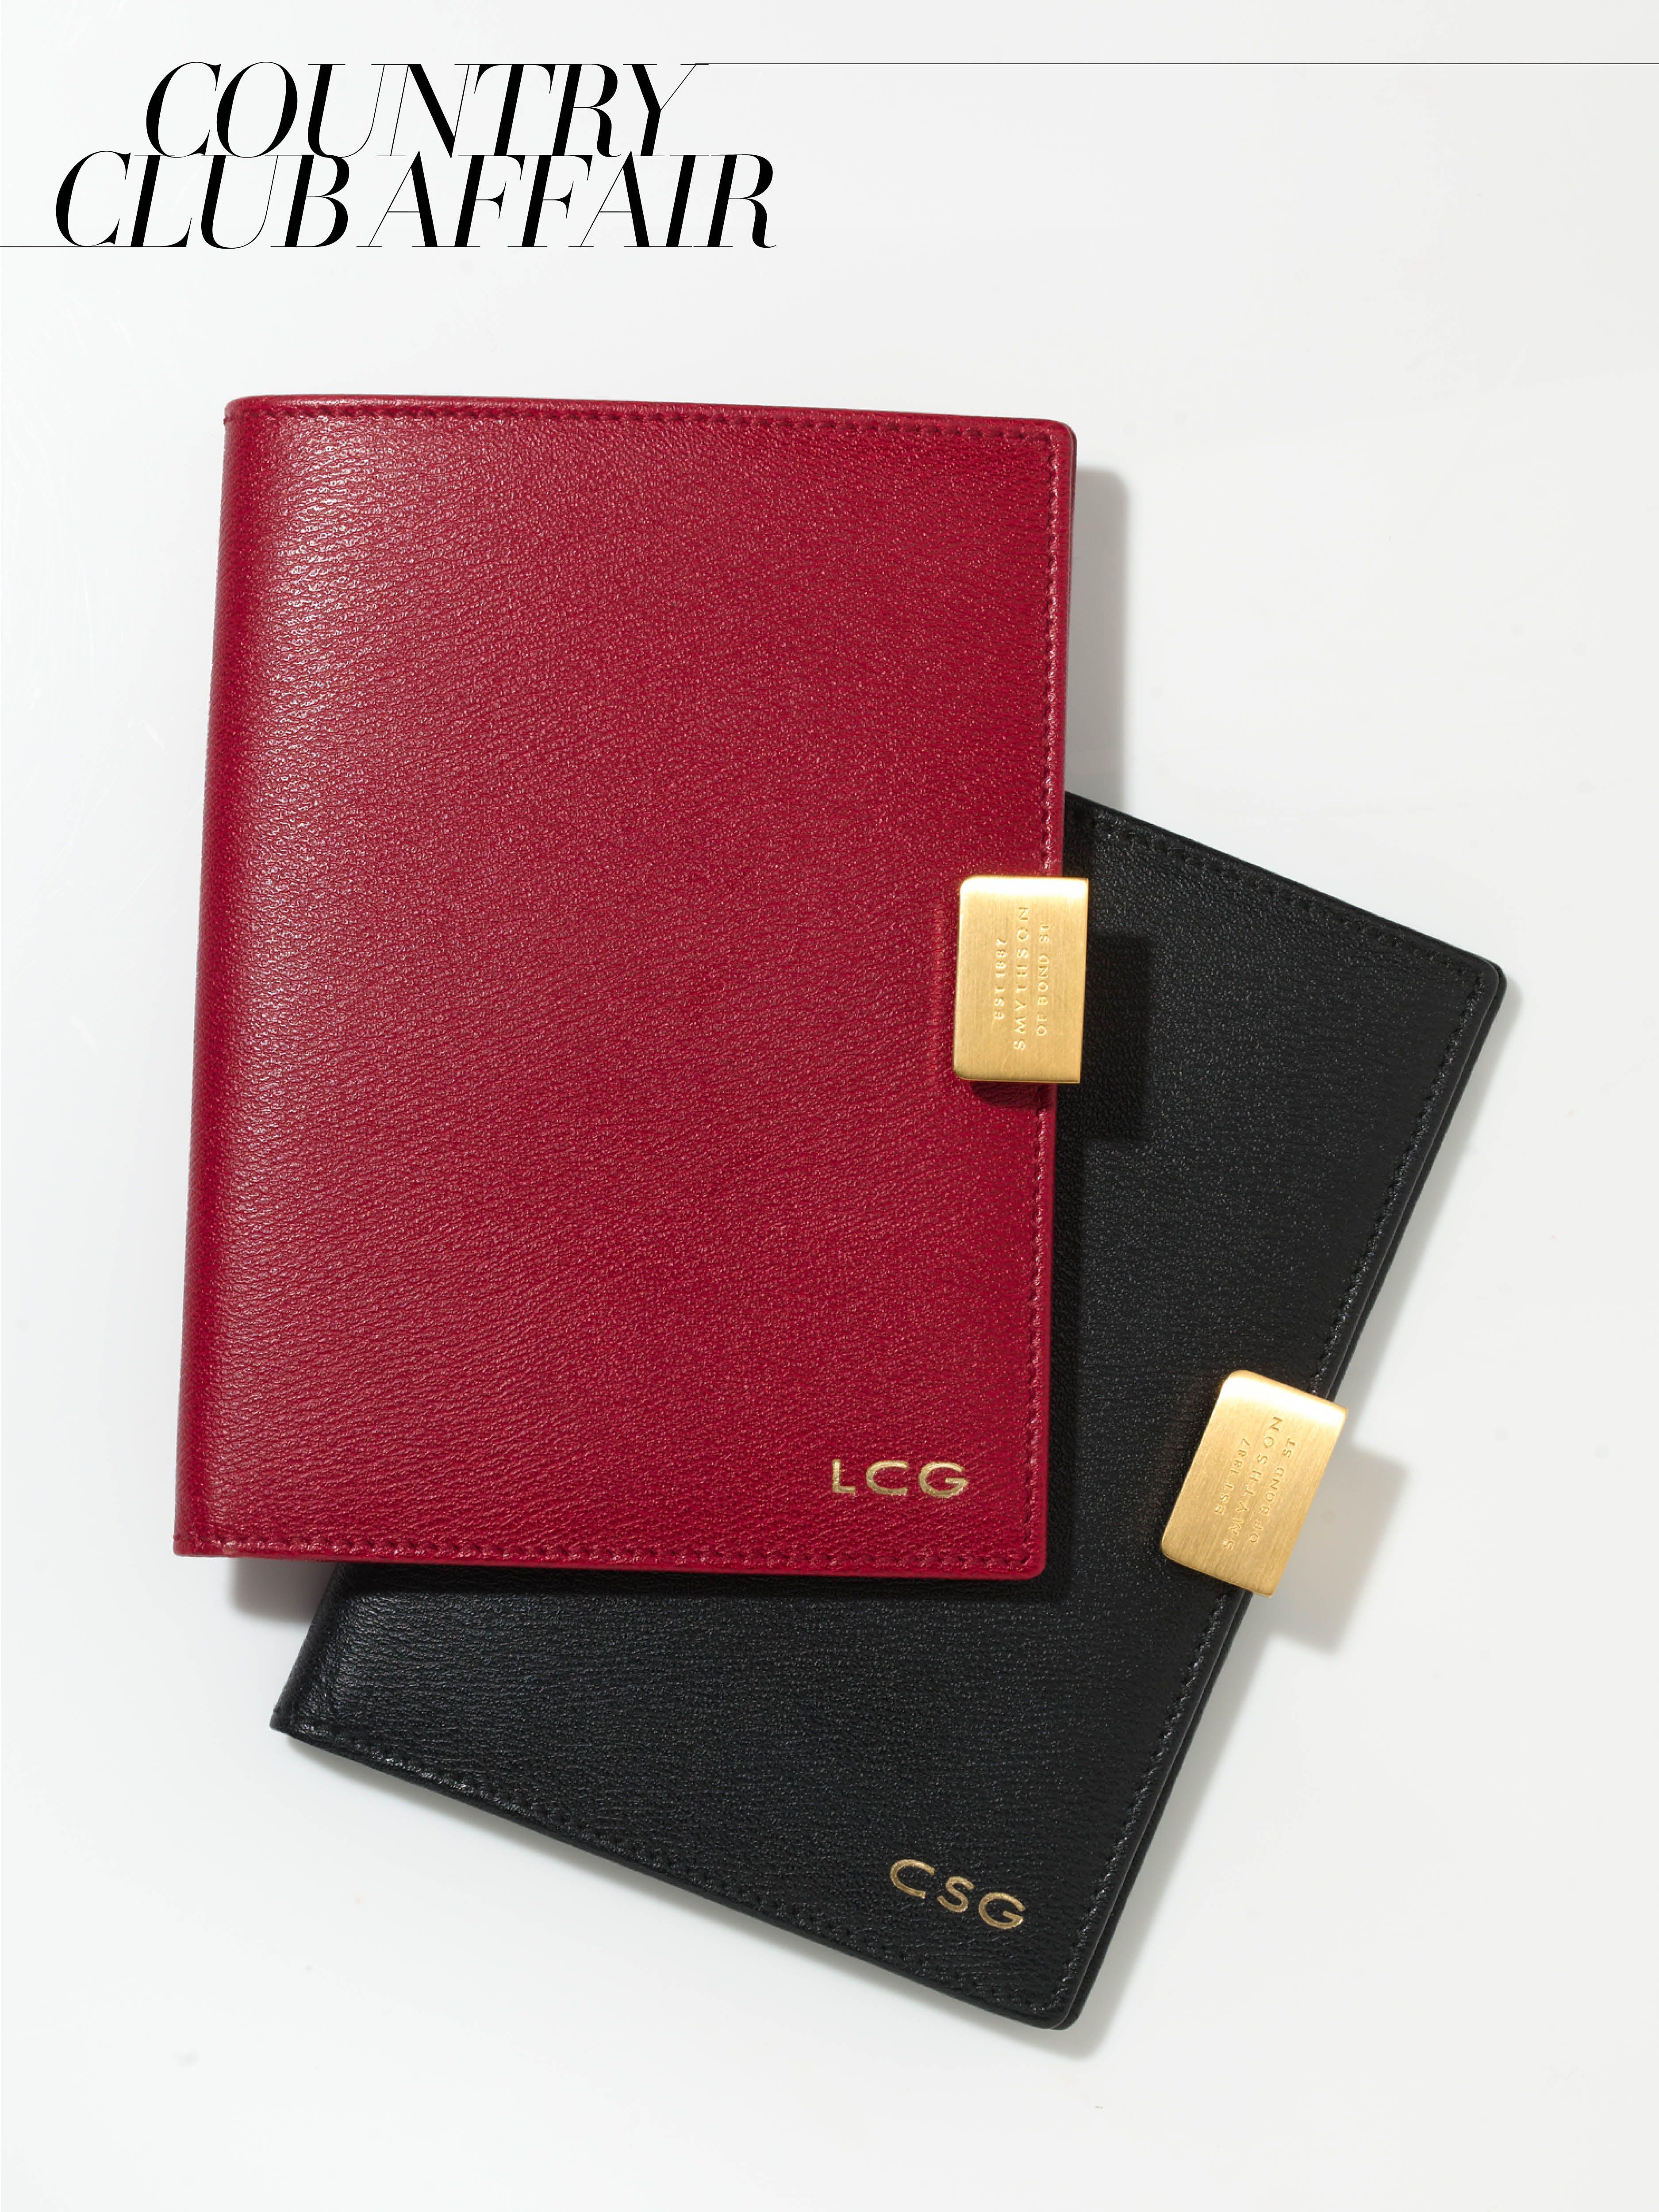 41171b0cca0 Smythson monogrammed passport cover